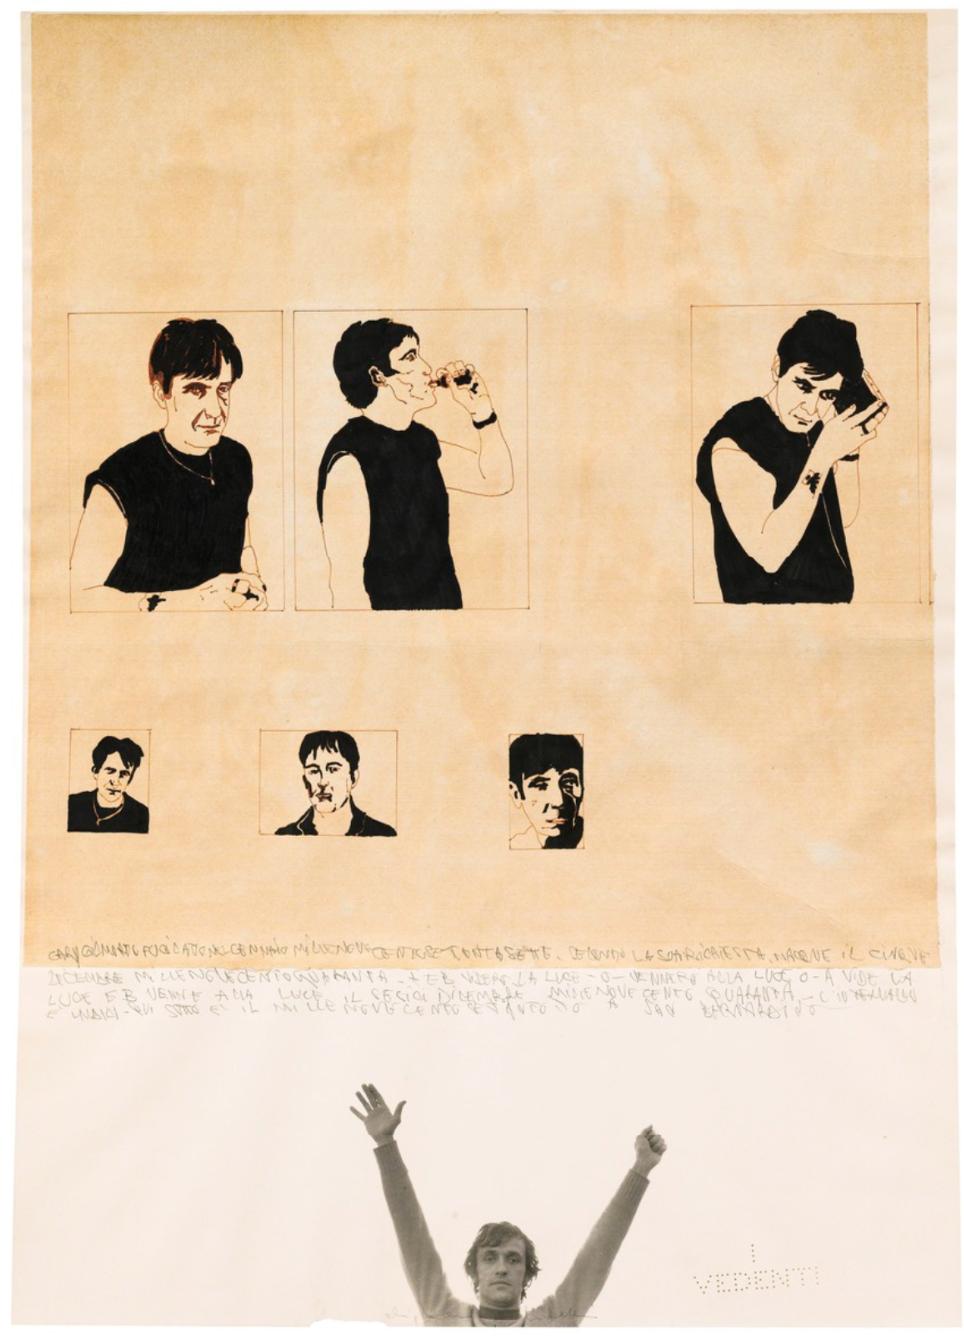 Alighiero e Boetti,  San Bernardino (Gary Gilmore) , 1978, Collage and mixed media on paper.